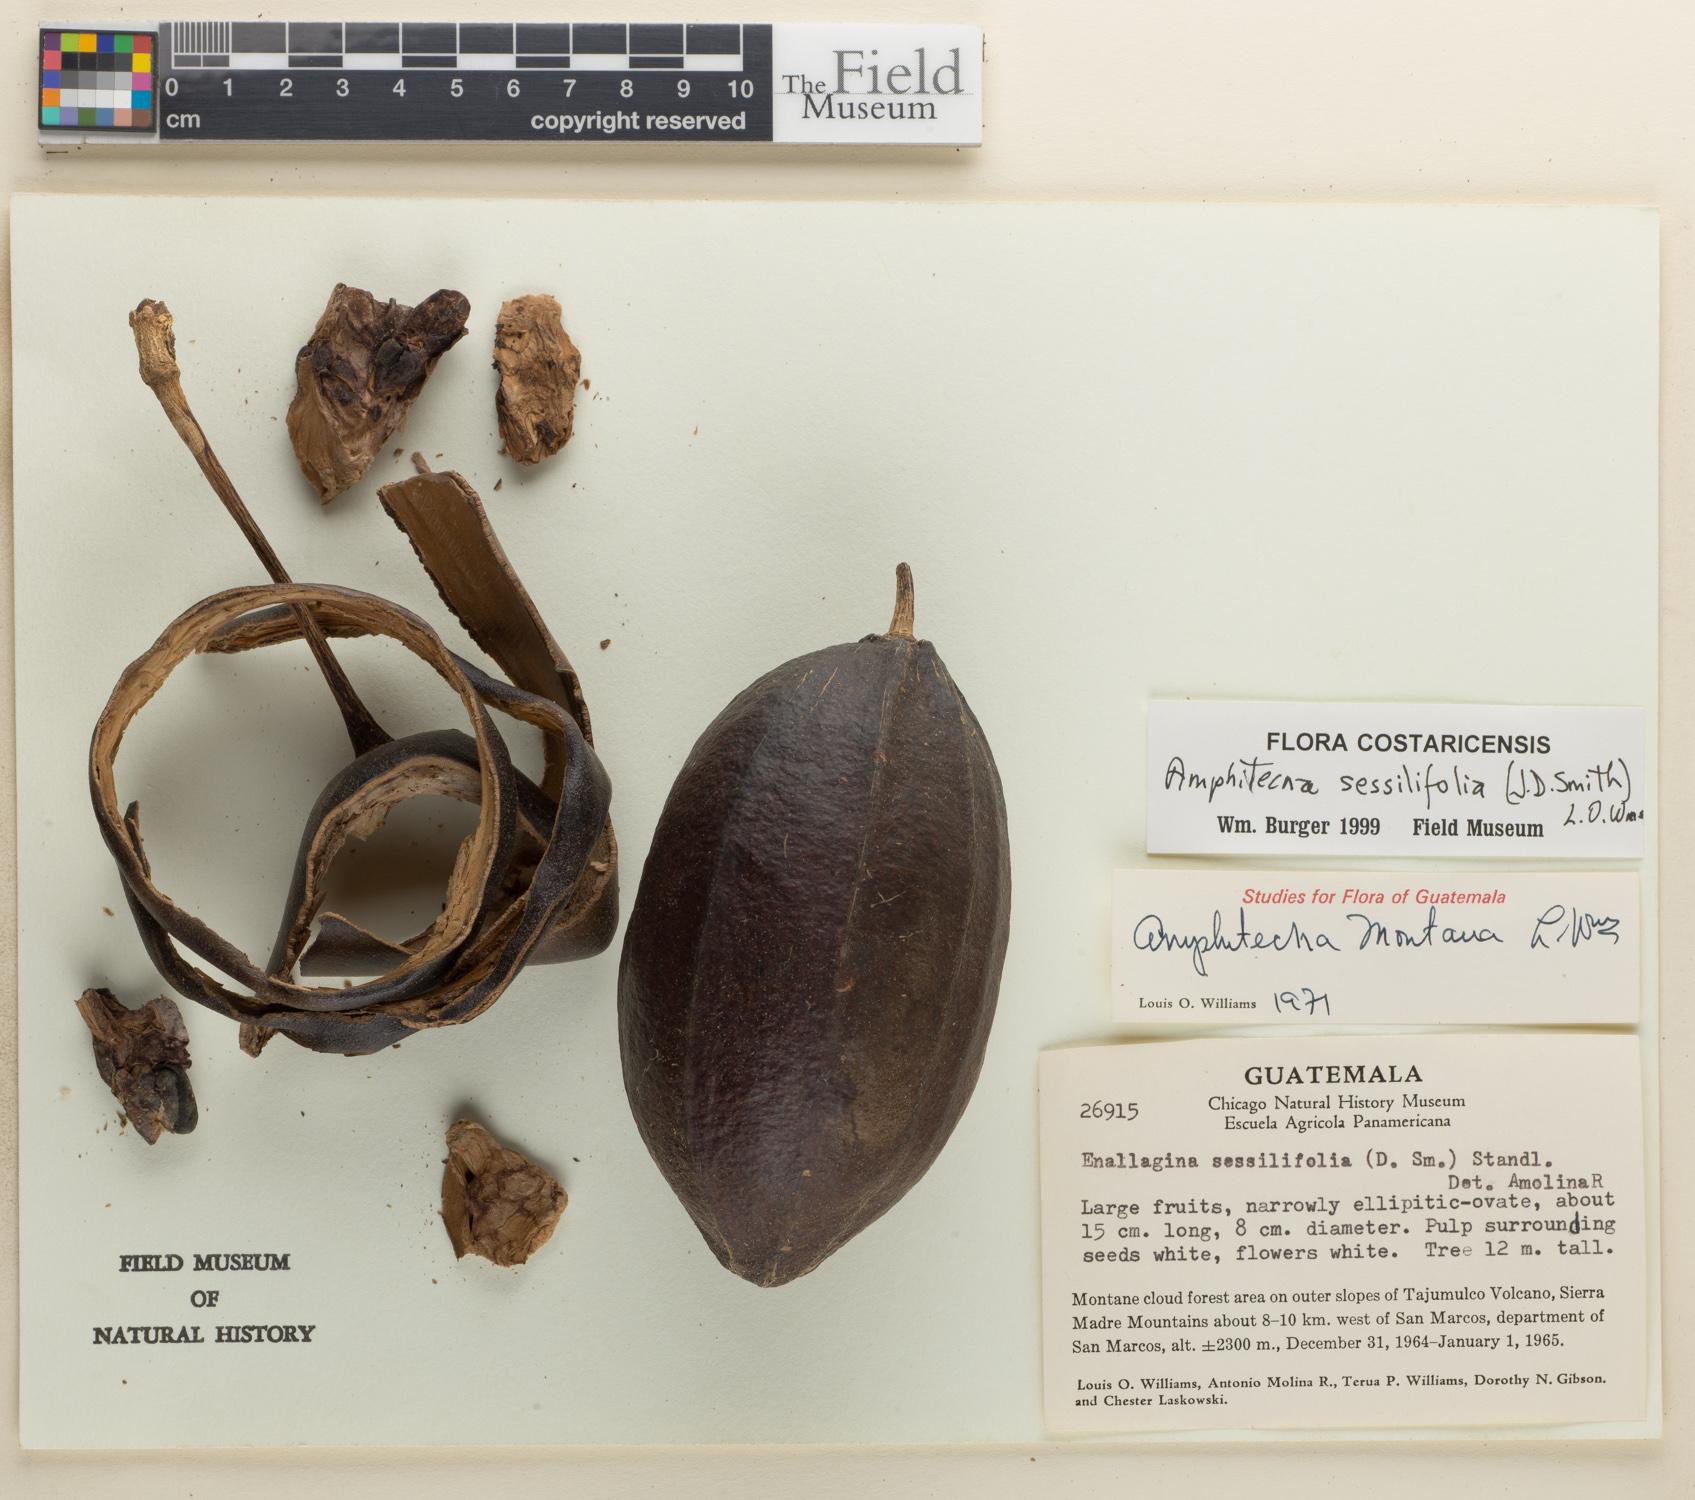 Amphitecna sessilifolia image